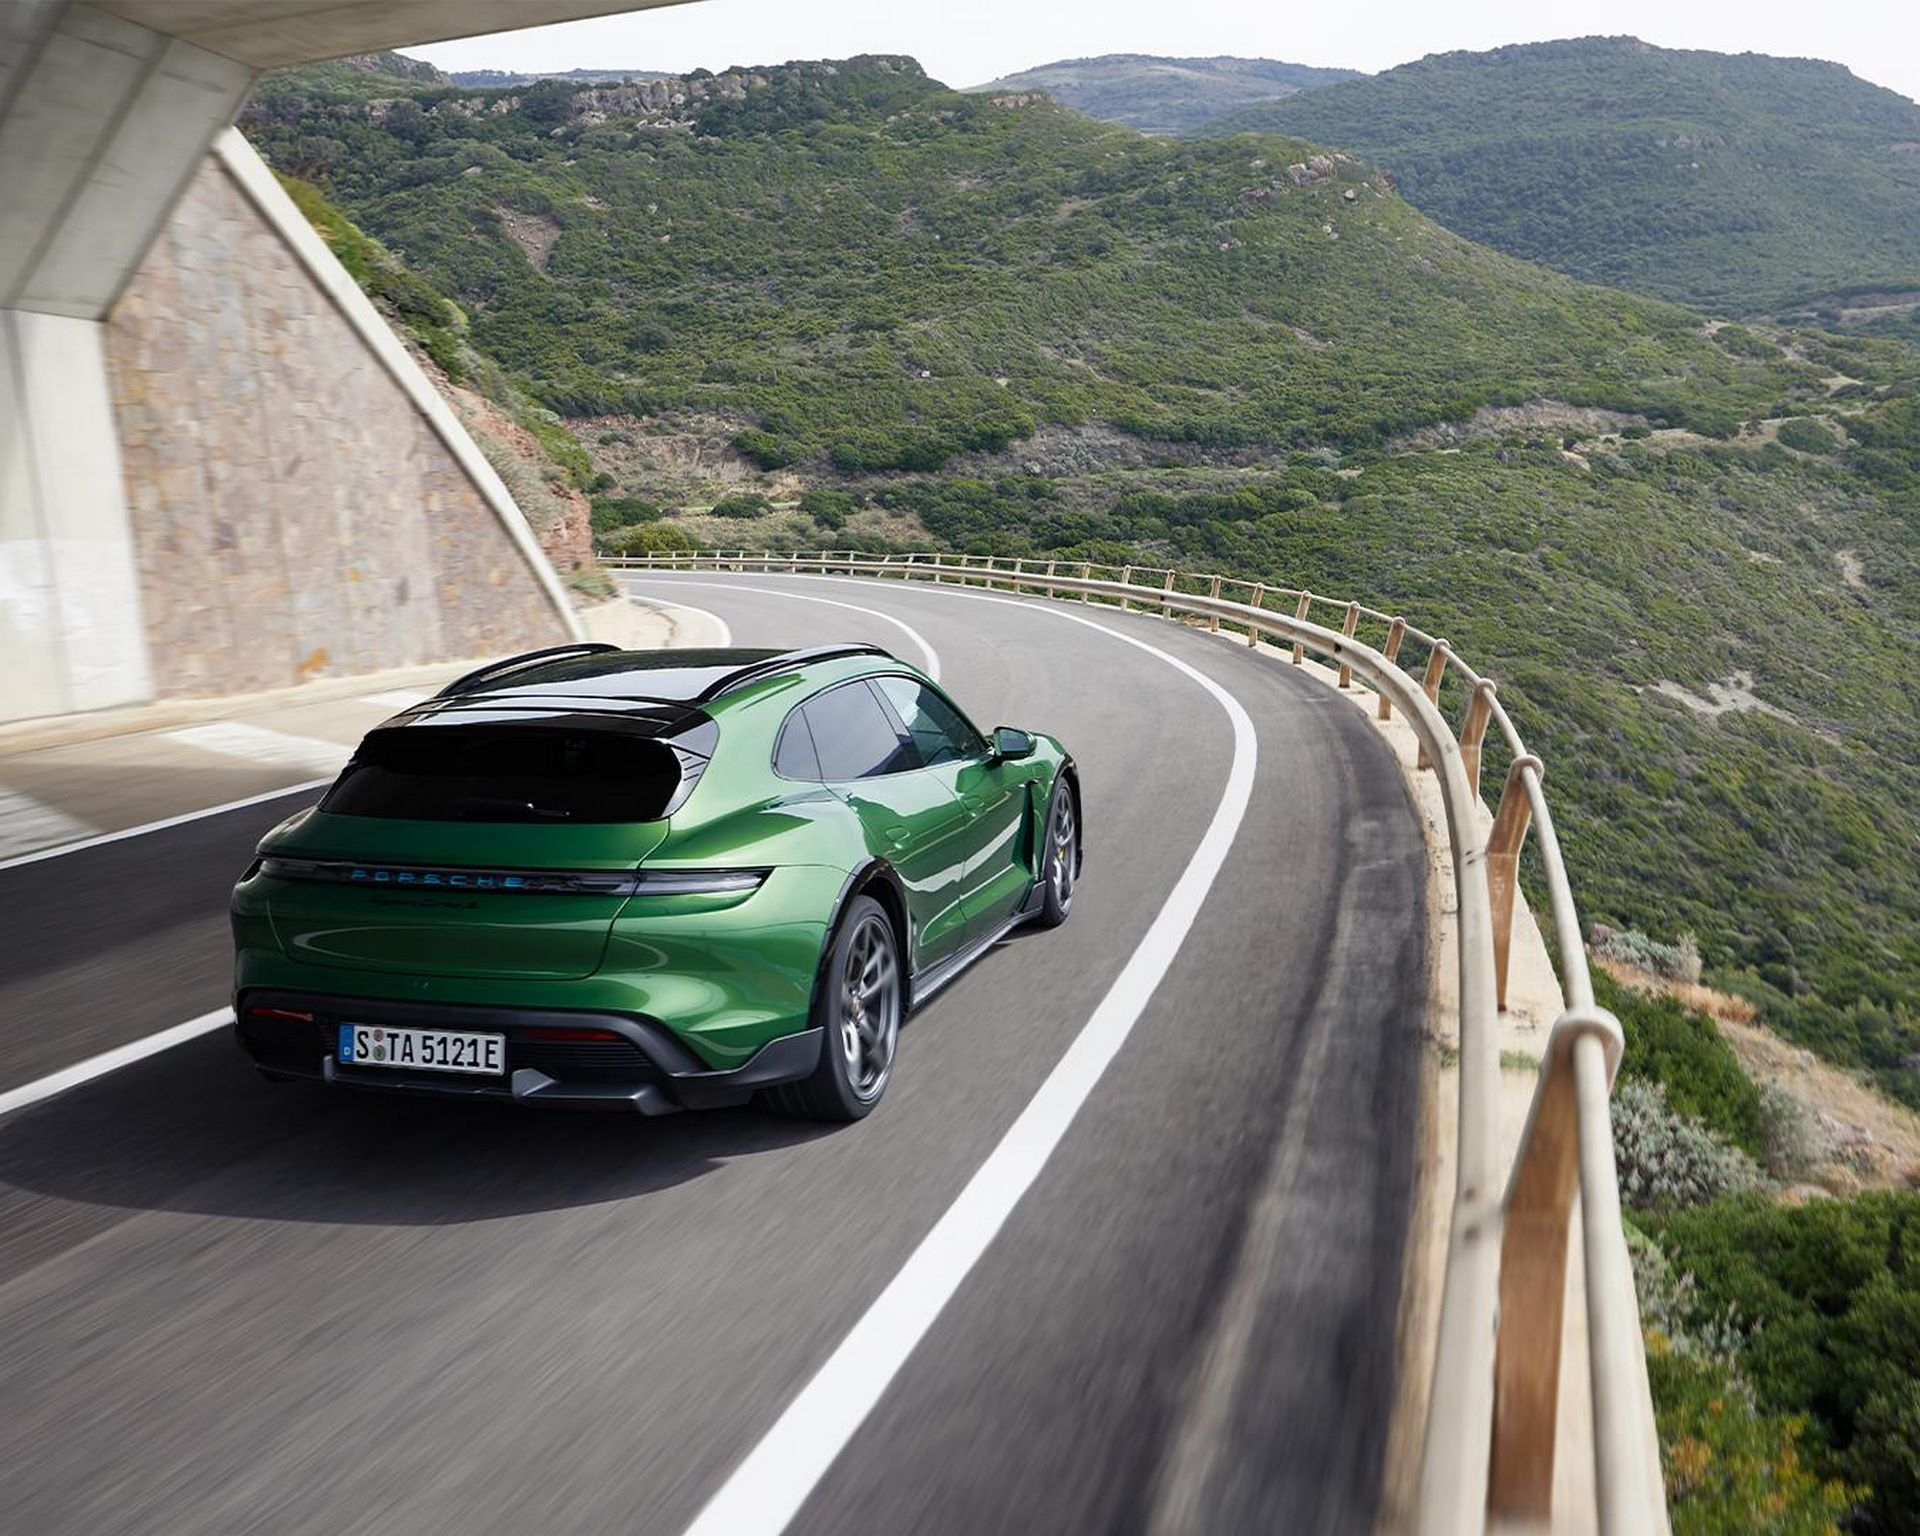 Porsche-Taycan-Cross-Turismo-23